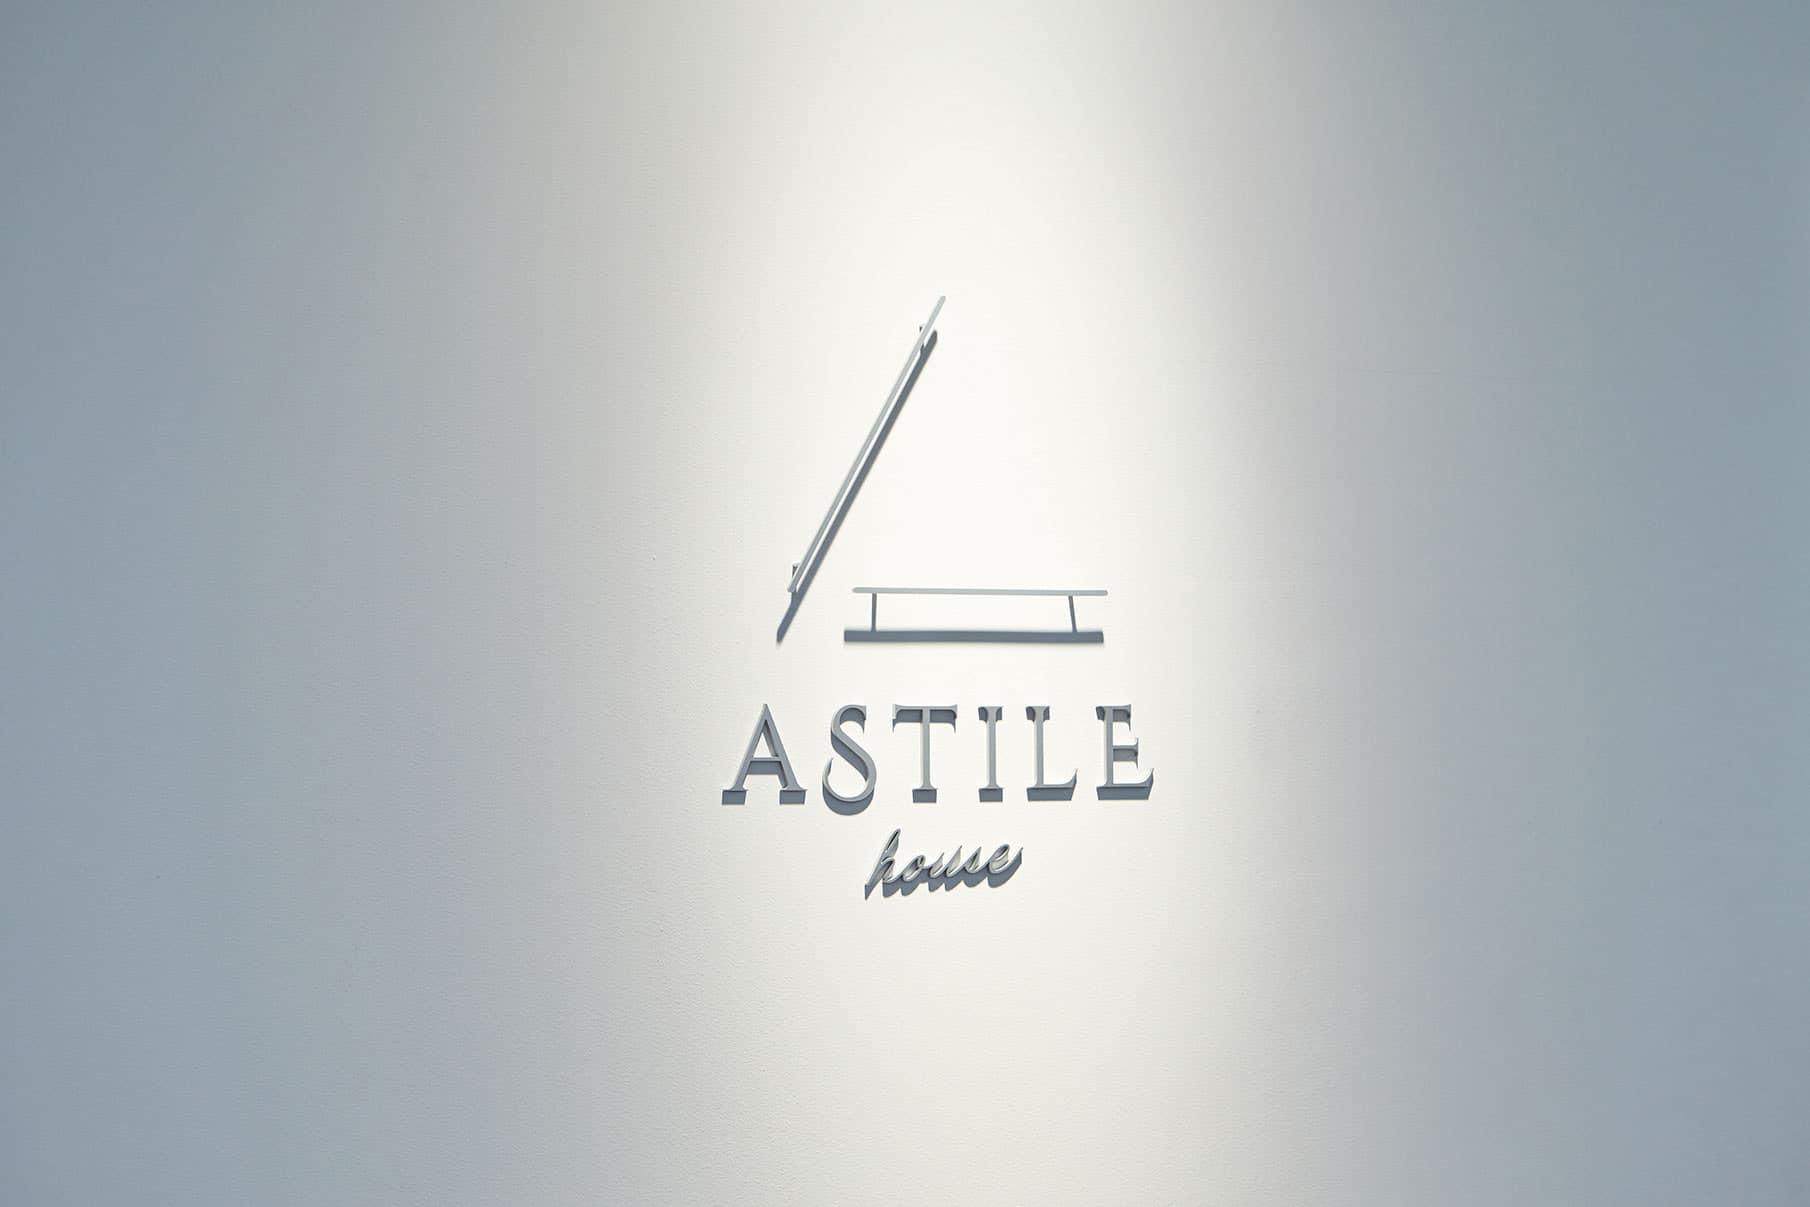 ASTILE house - Brand Identity 1